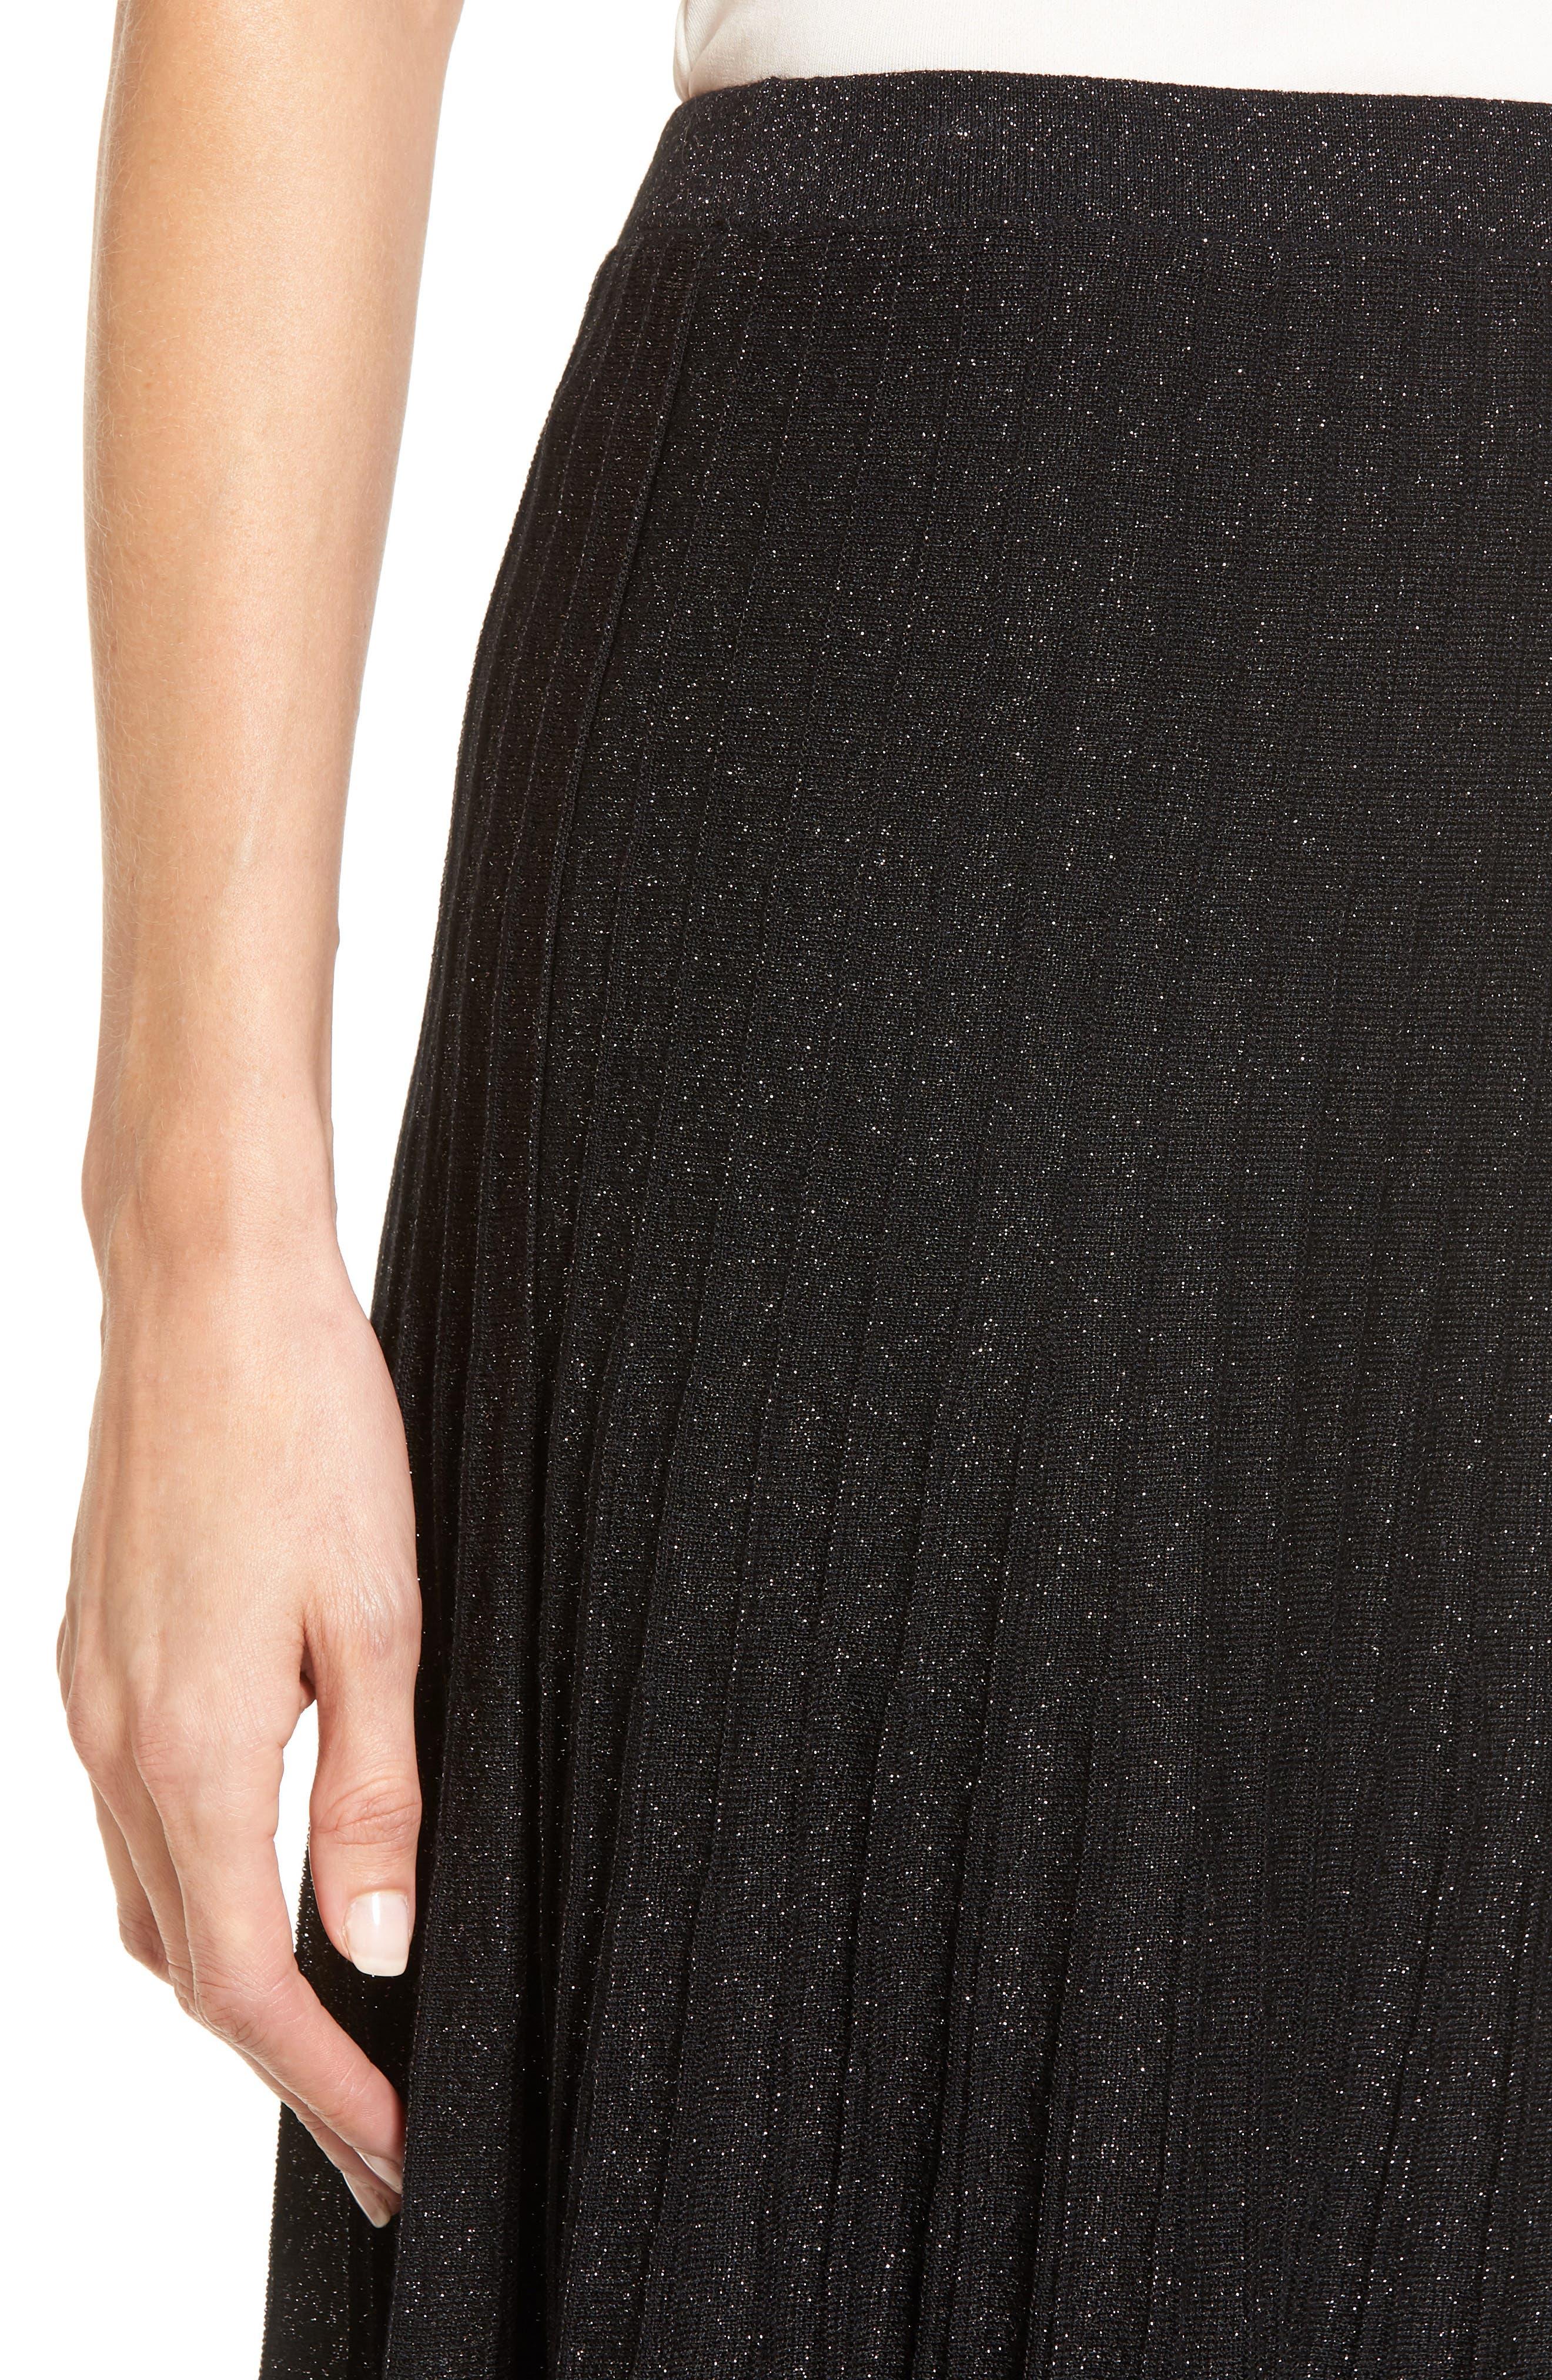 Luminary Pleated Midi Skirt,                             Alternate thumbnail 4, color,                             Black Mix